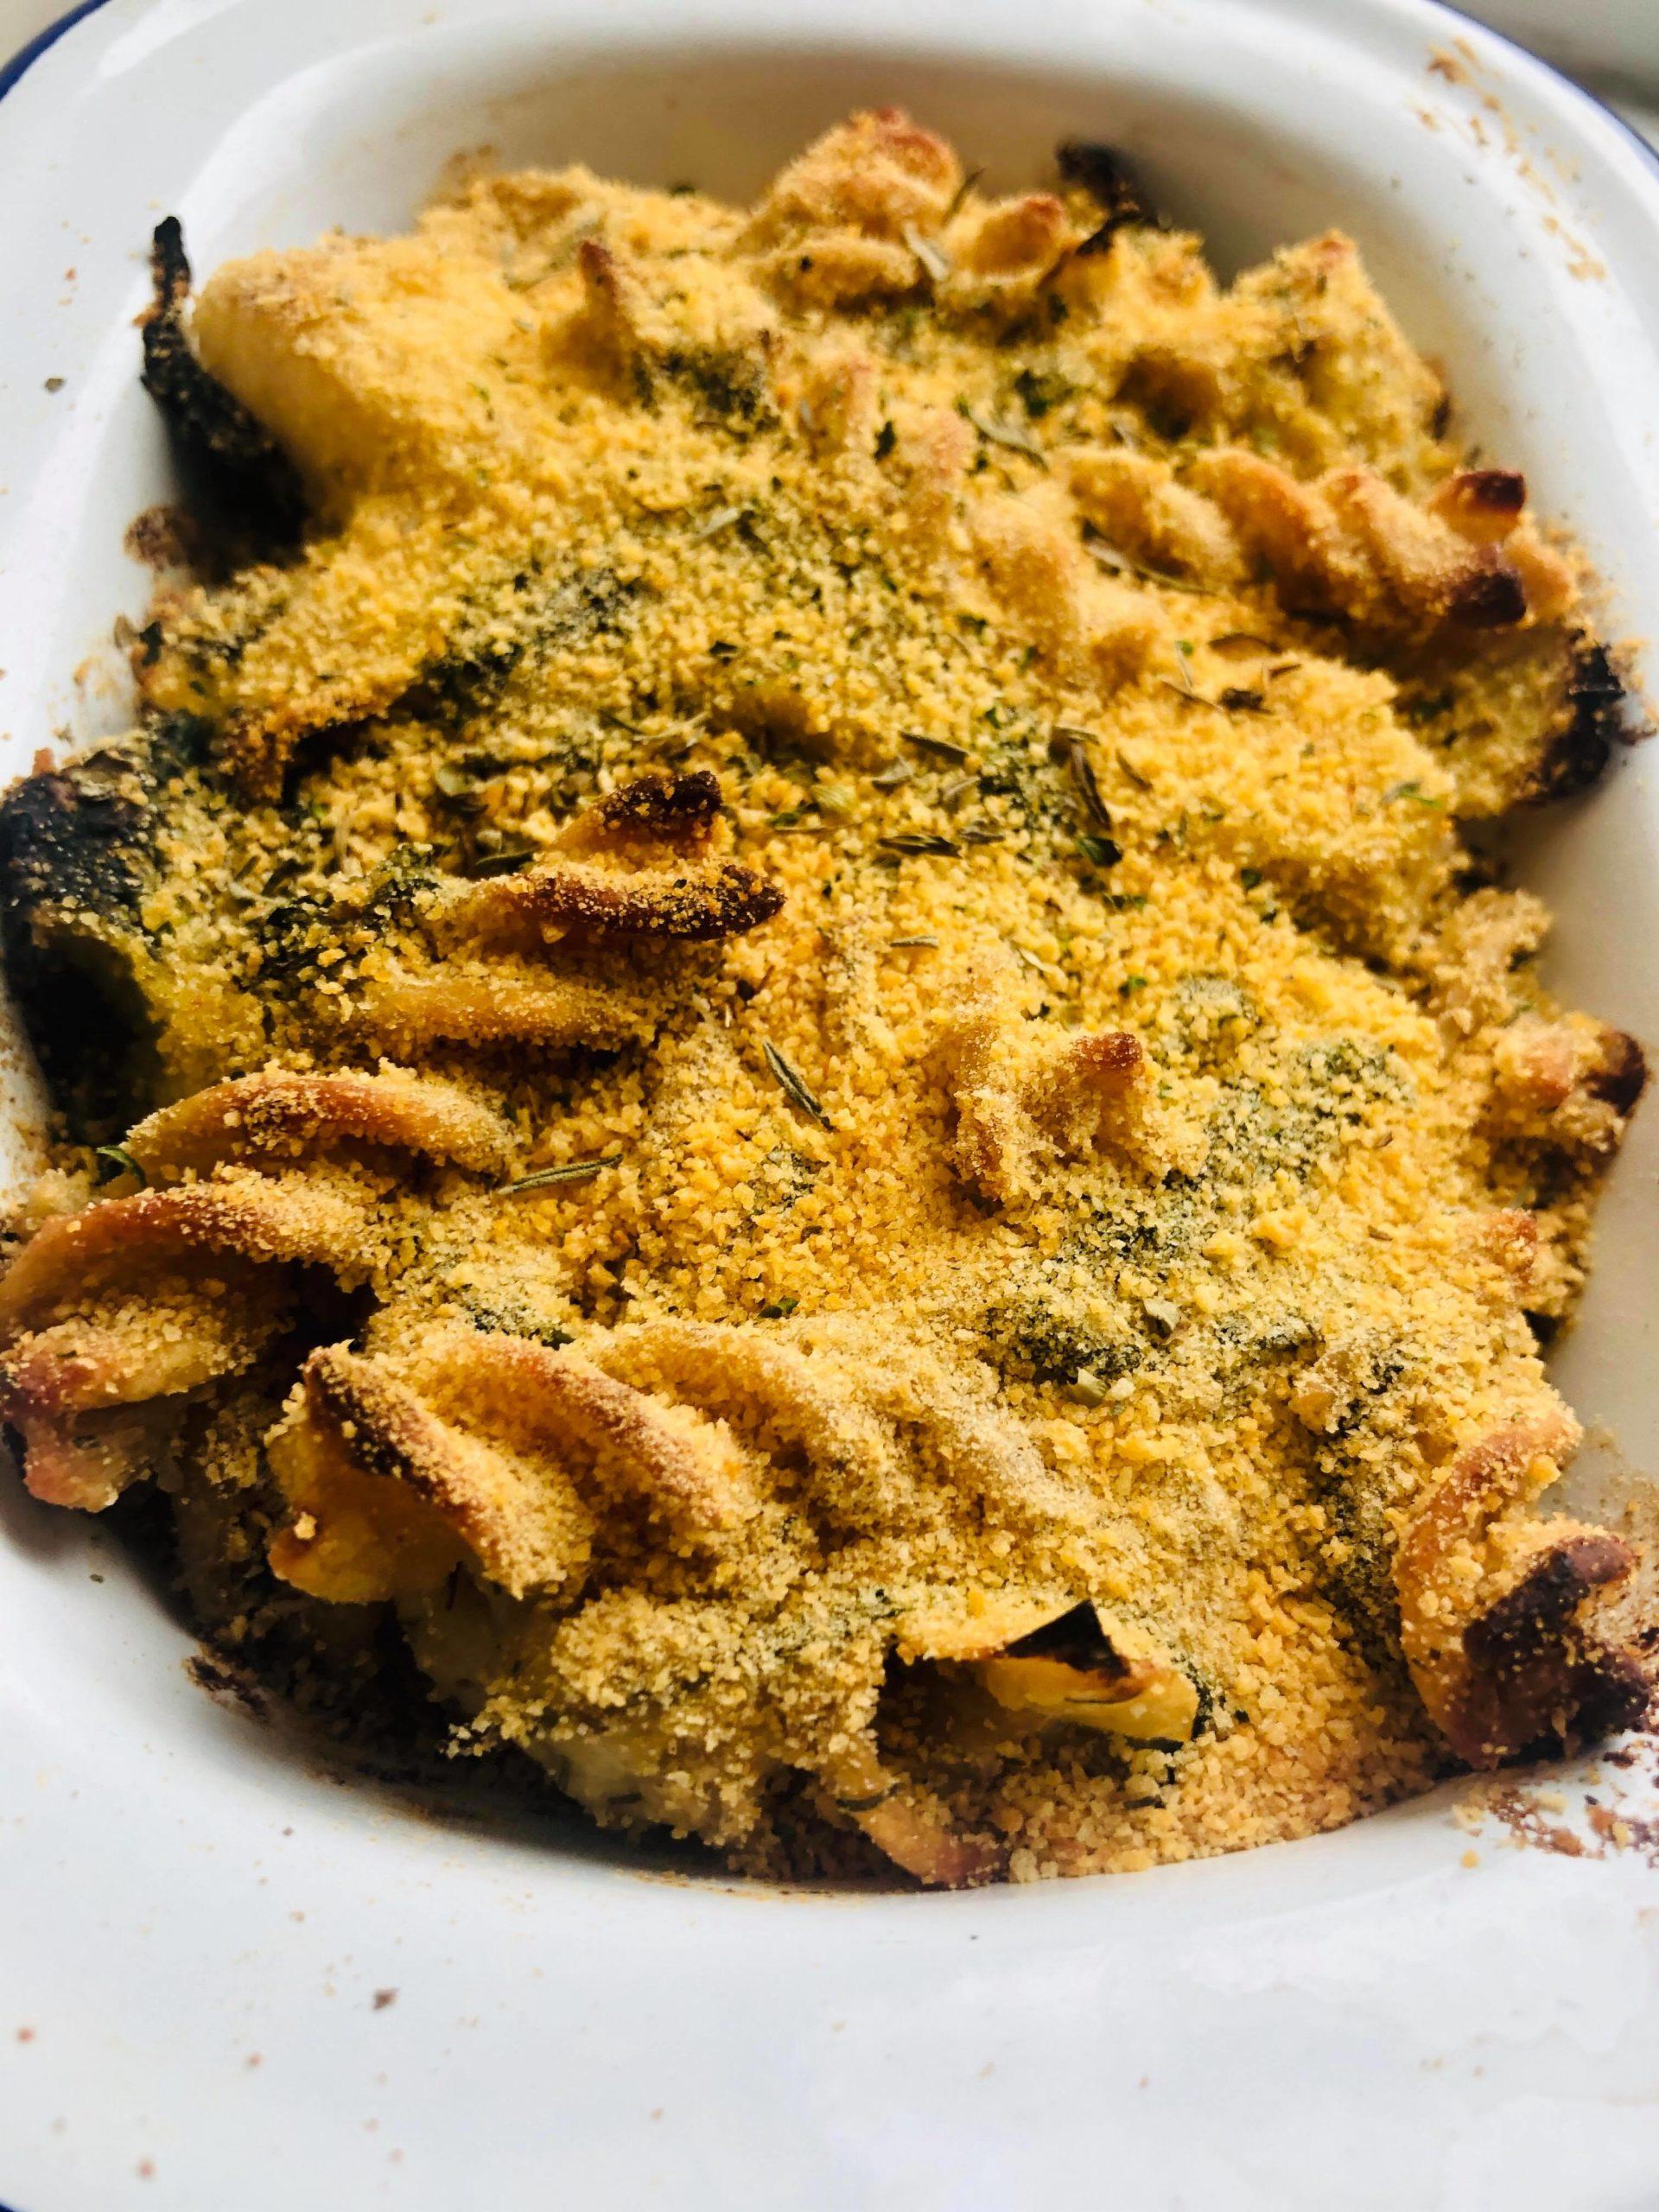 Creamy Vegan Spinach & Artichoke Pasta Bake